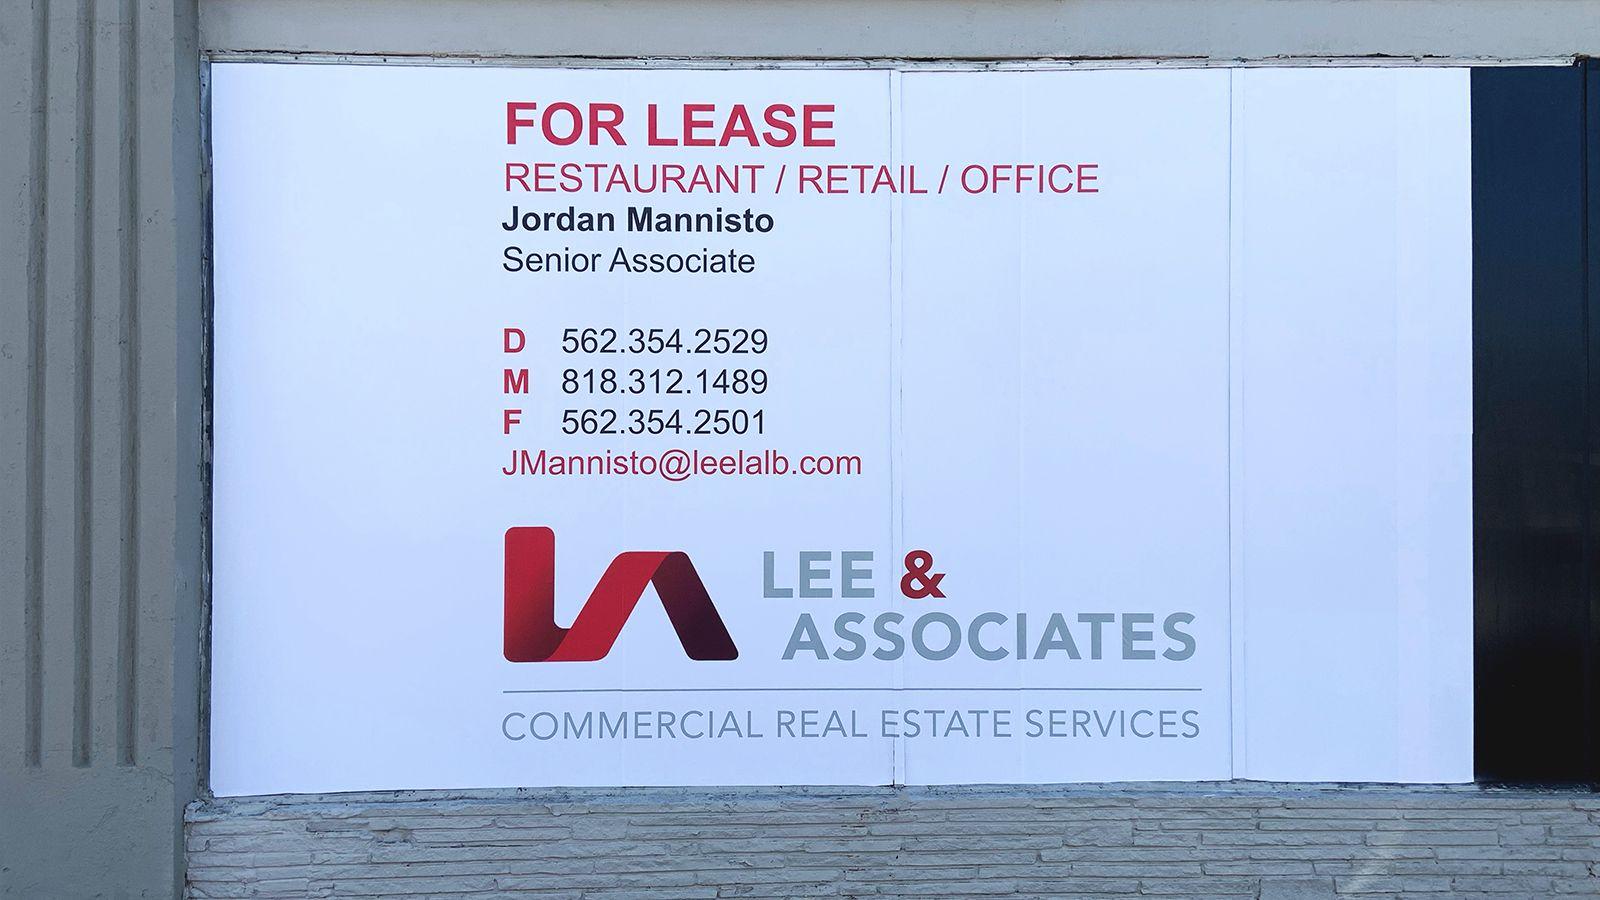 Lee & associates window decal